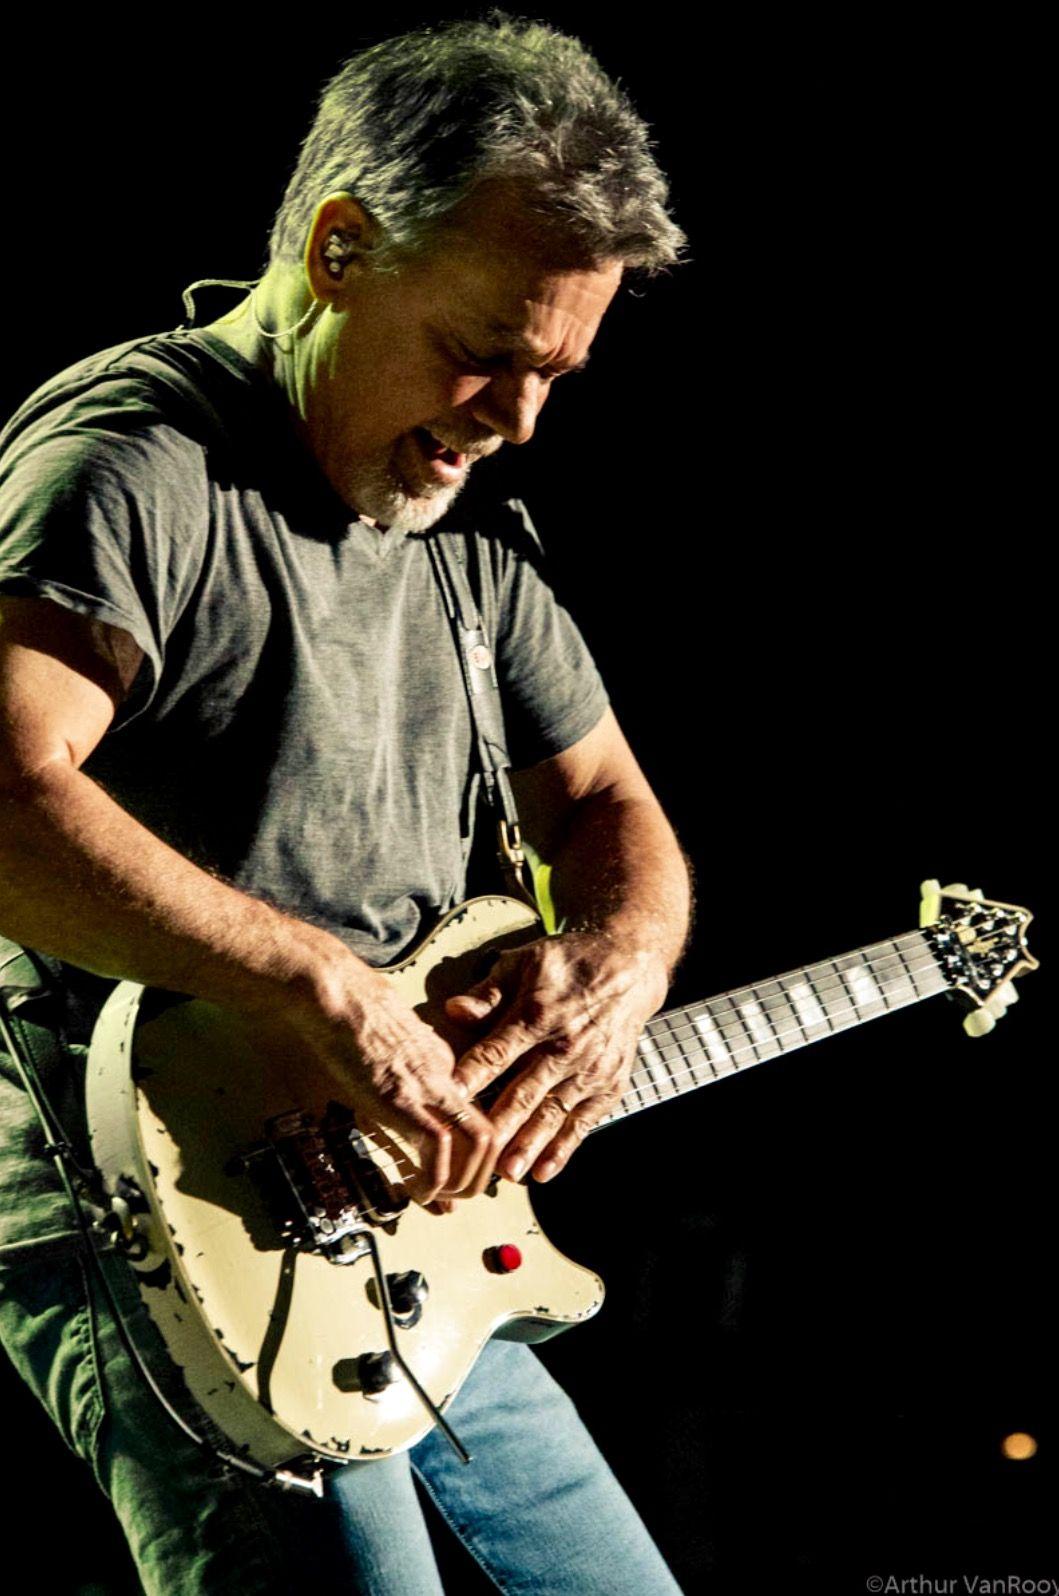 Pin By Dave Bennett On Evh The King Eddie Van Halen Van Halen Guitar Hero